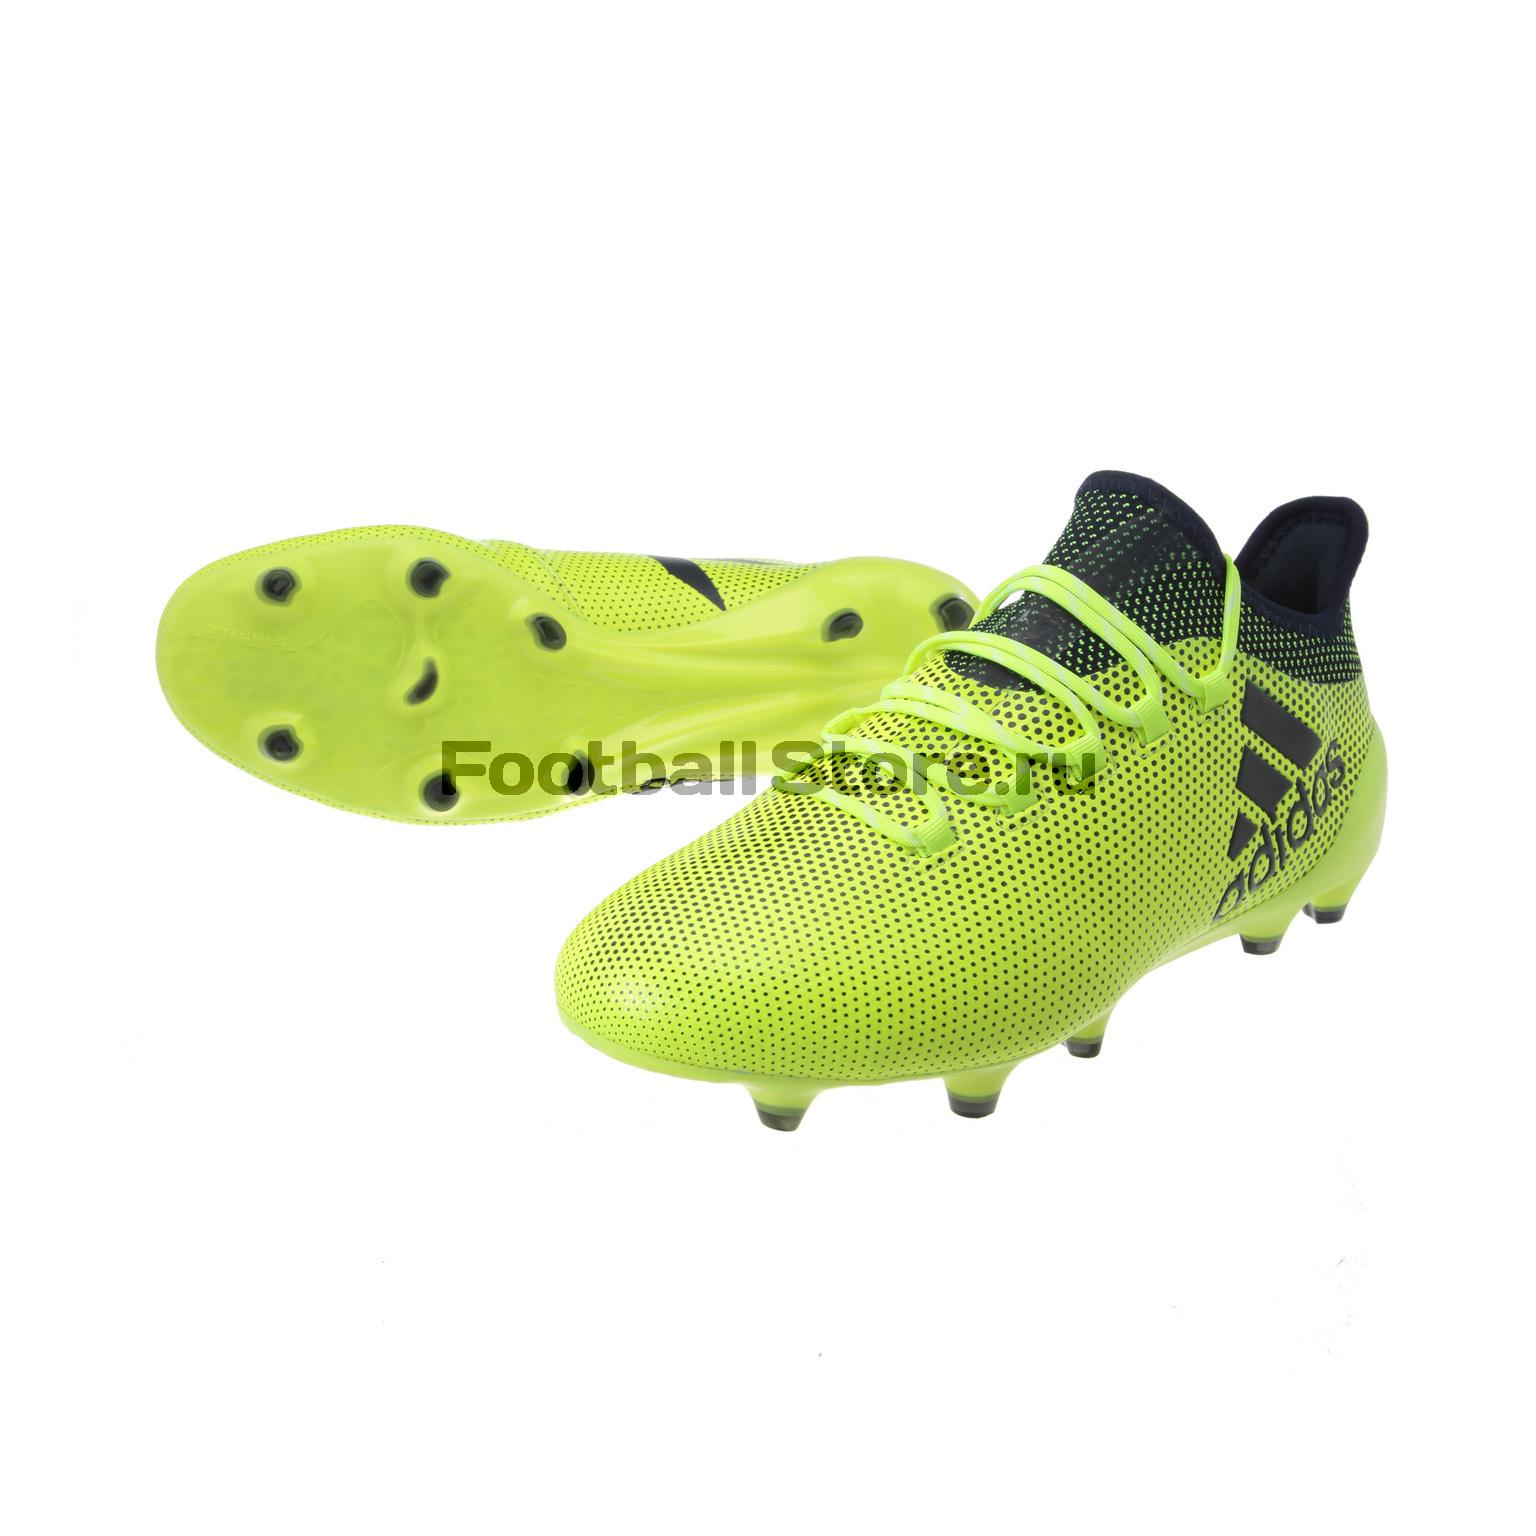 Бутсы Adidas X 17.1 FG S82286 бутсы adidas x 17 1 fg bb6353